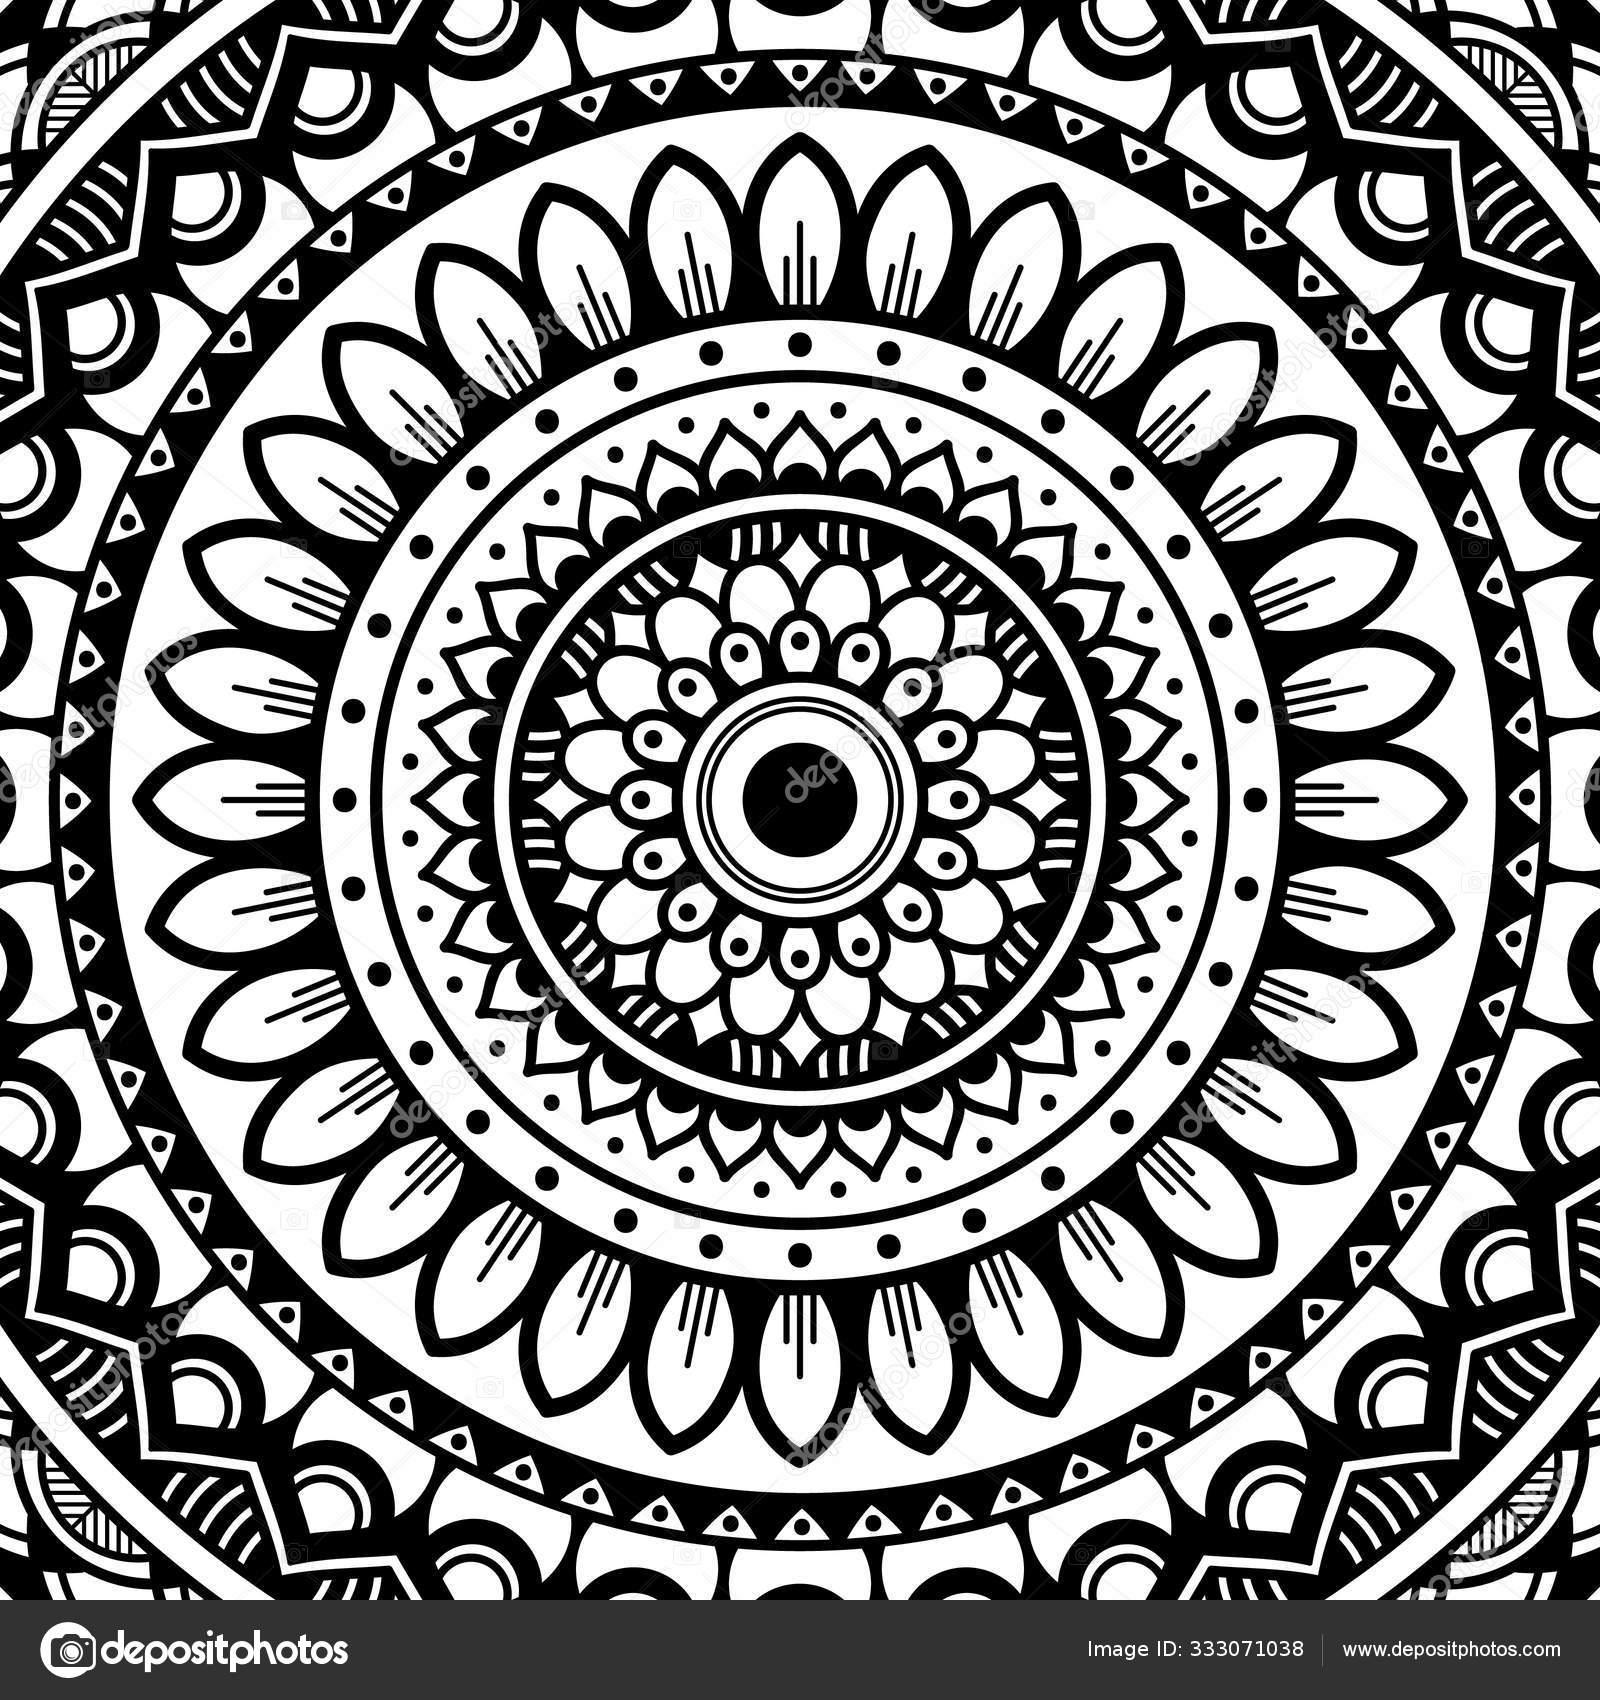 Mandala Pattern Black White Decorative Ornament Stress Therapy Patterns Vector Image By C Urban 4k Web Gmail Com Stock 333071038